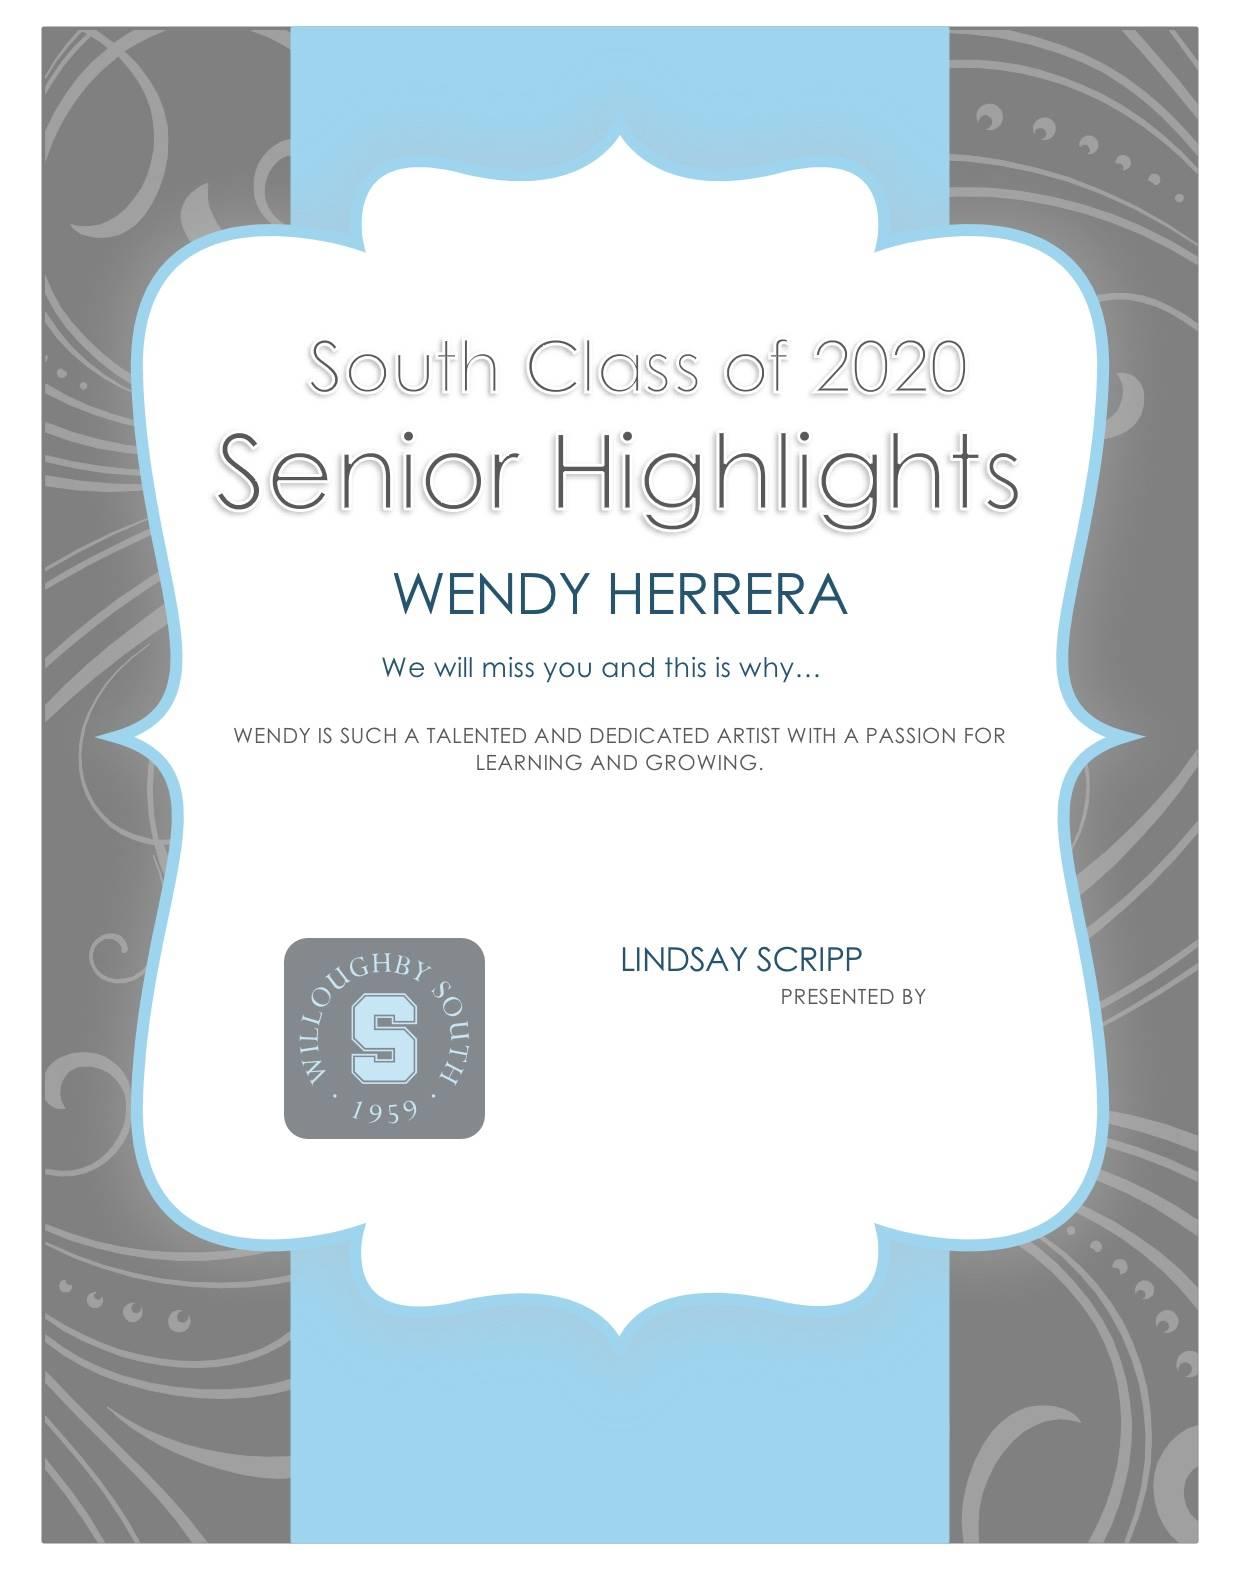 Wendy Herrara